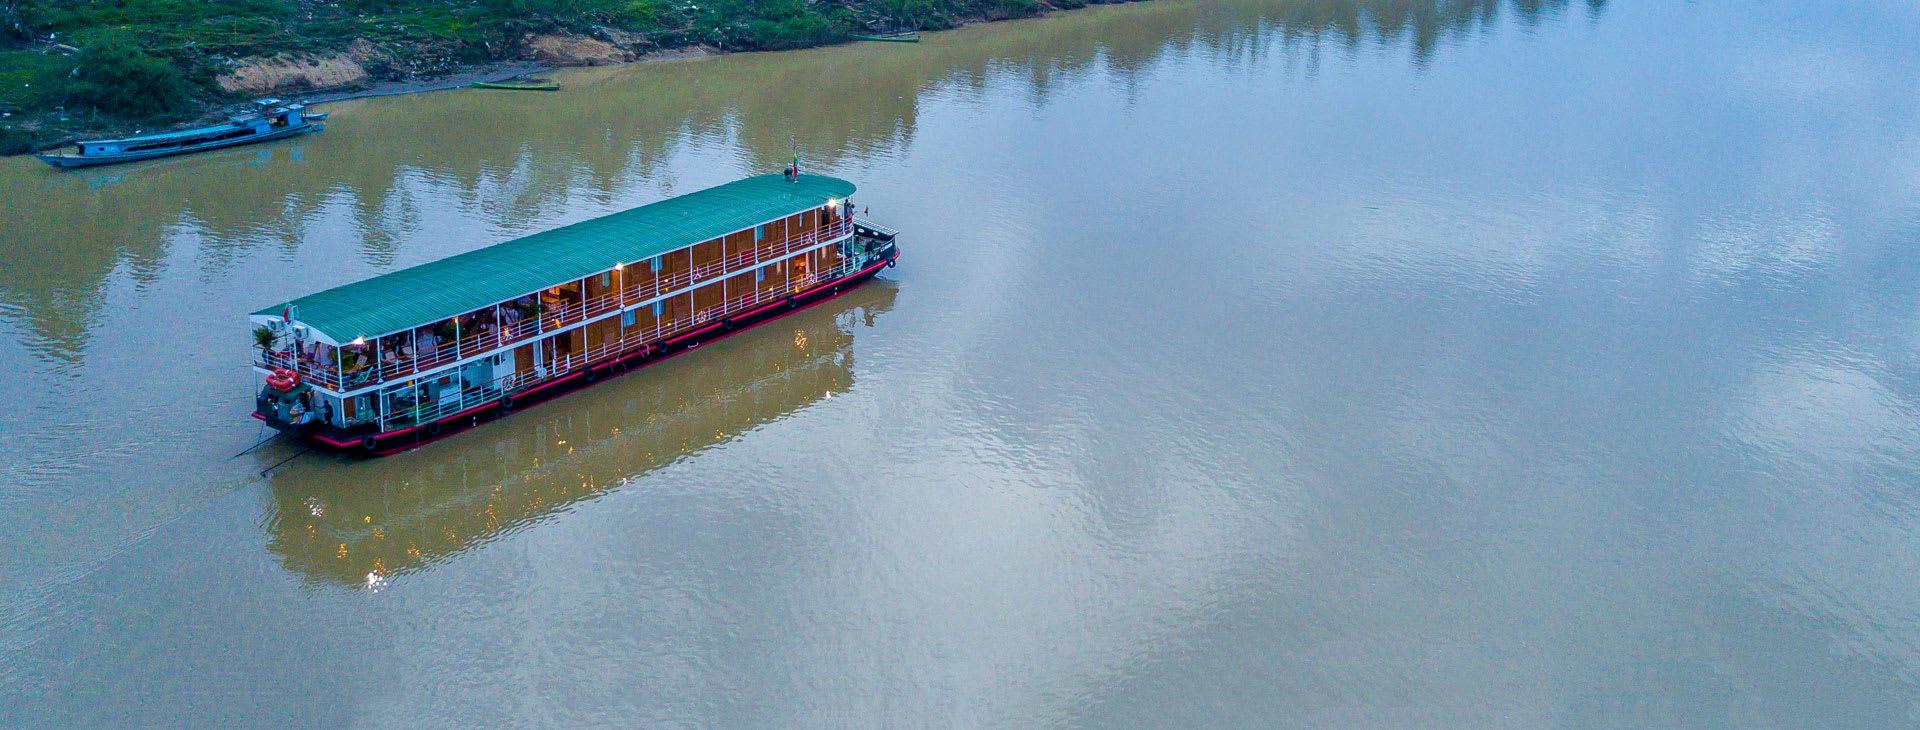 Zawgyi Pandaw on the river